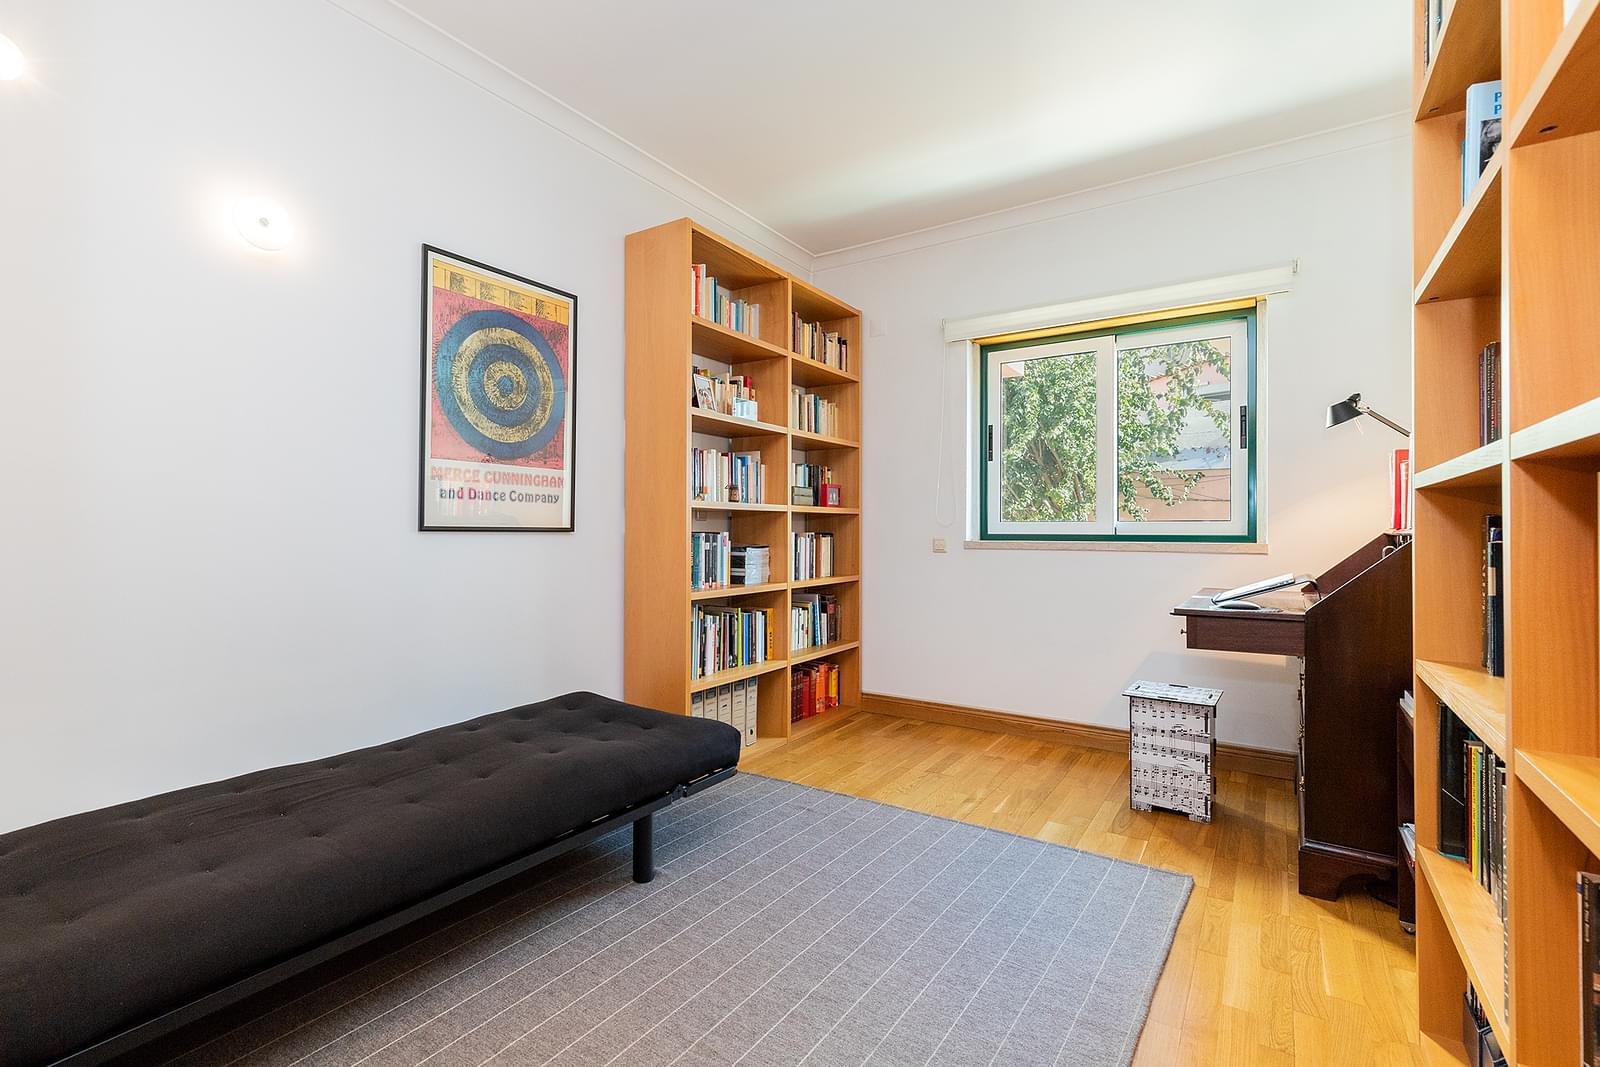 pf18967-apartamento-t2-lisboa-c48efa9f-6079-47e9-aec2-532d25f68948